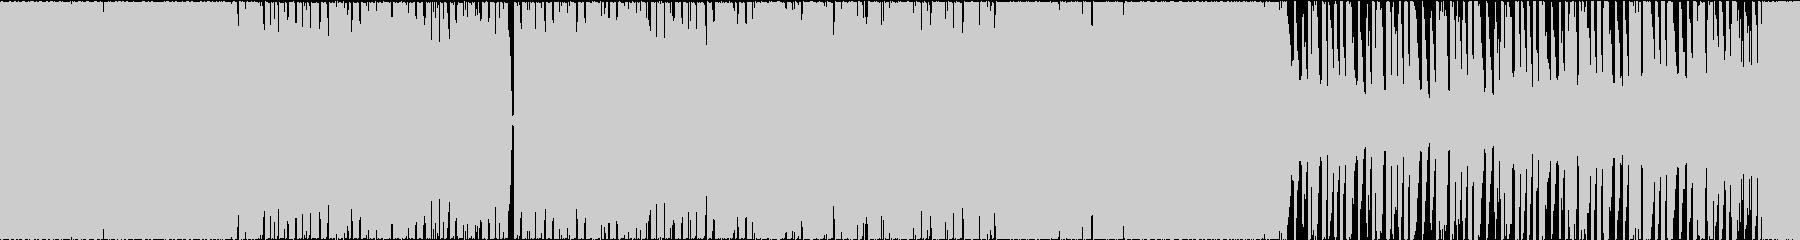 EDM オープニング スポーツ ループの未再生の波形